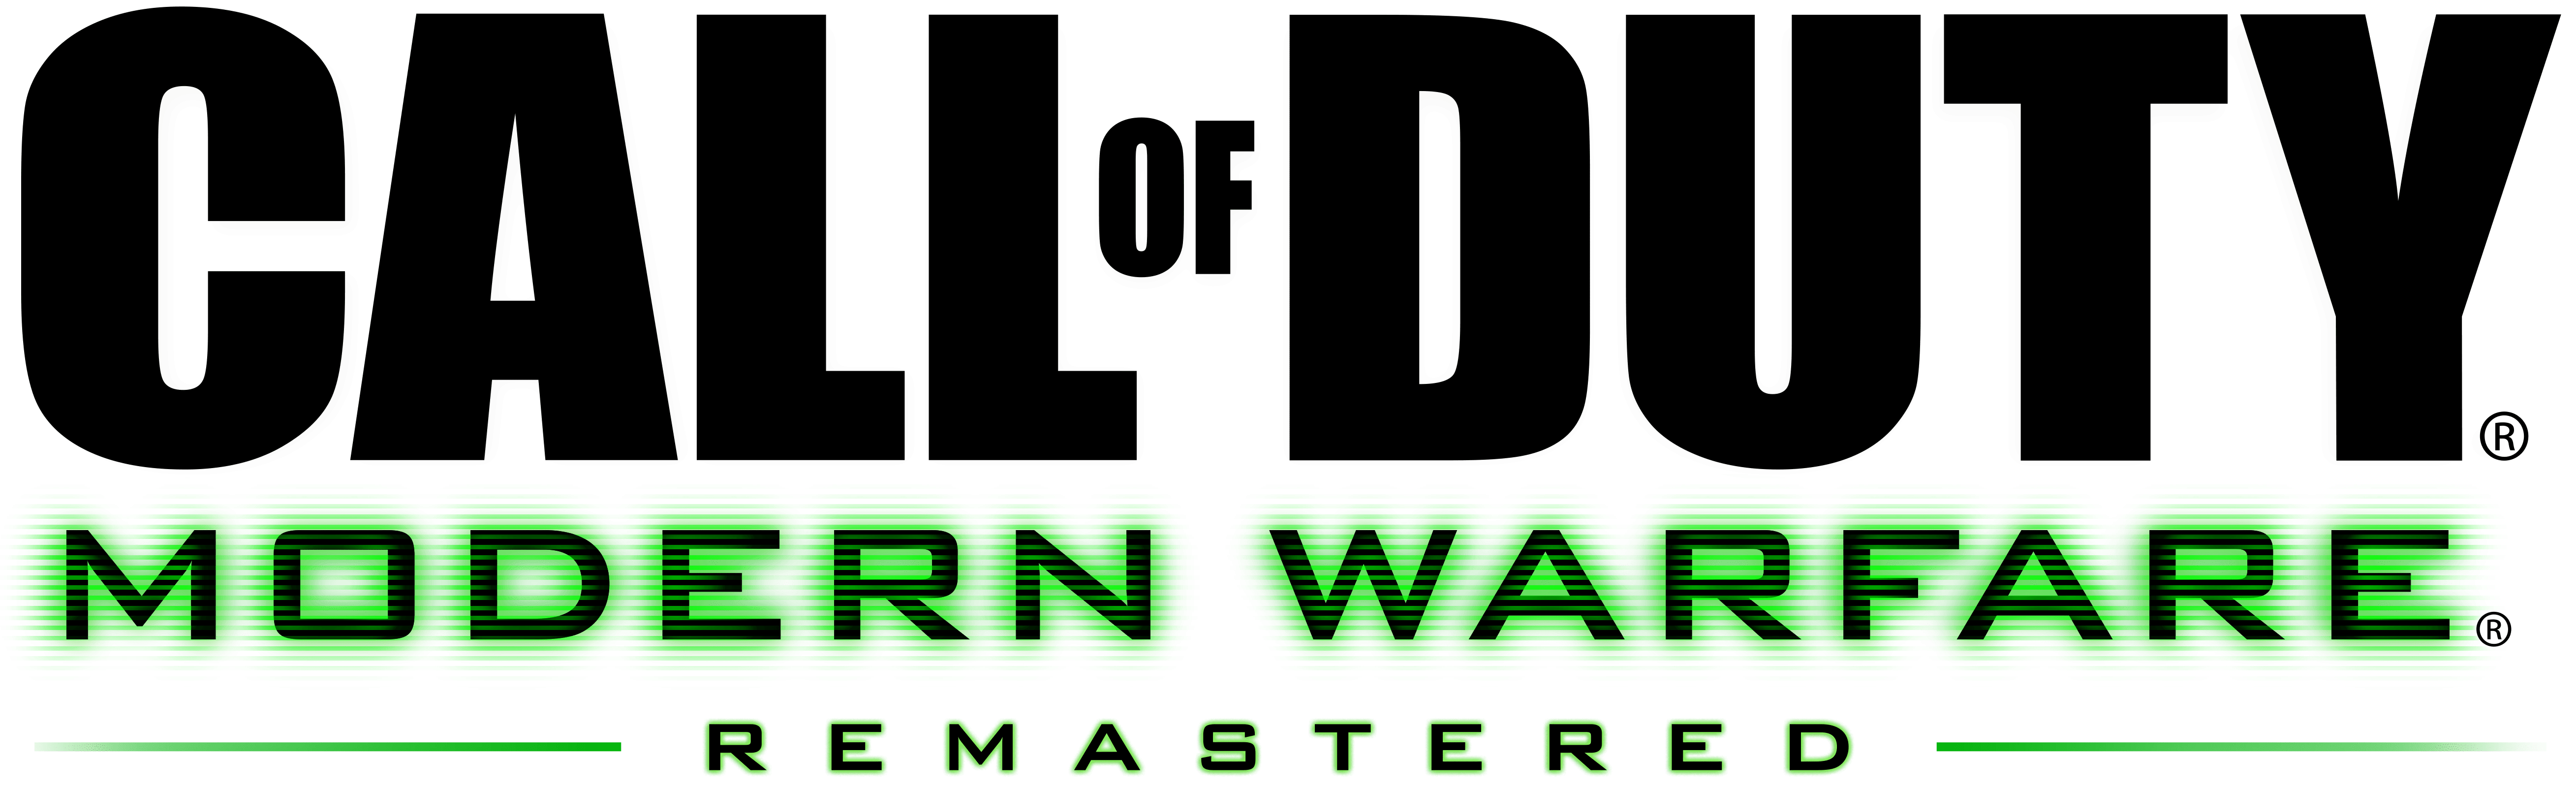 Call Of Duty Logo Png - Call Of Duty Logo PNG